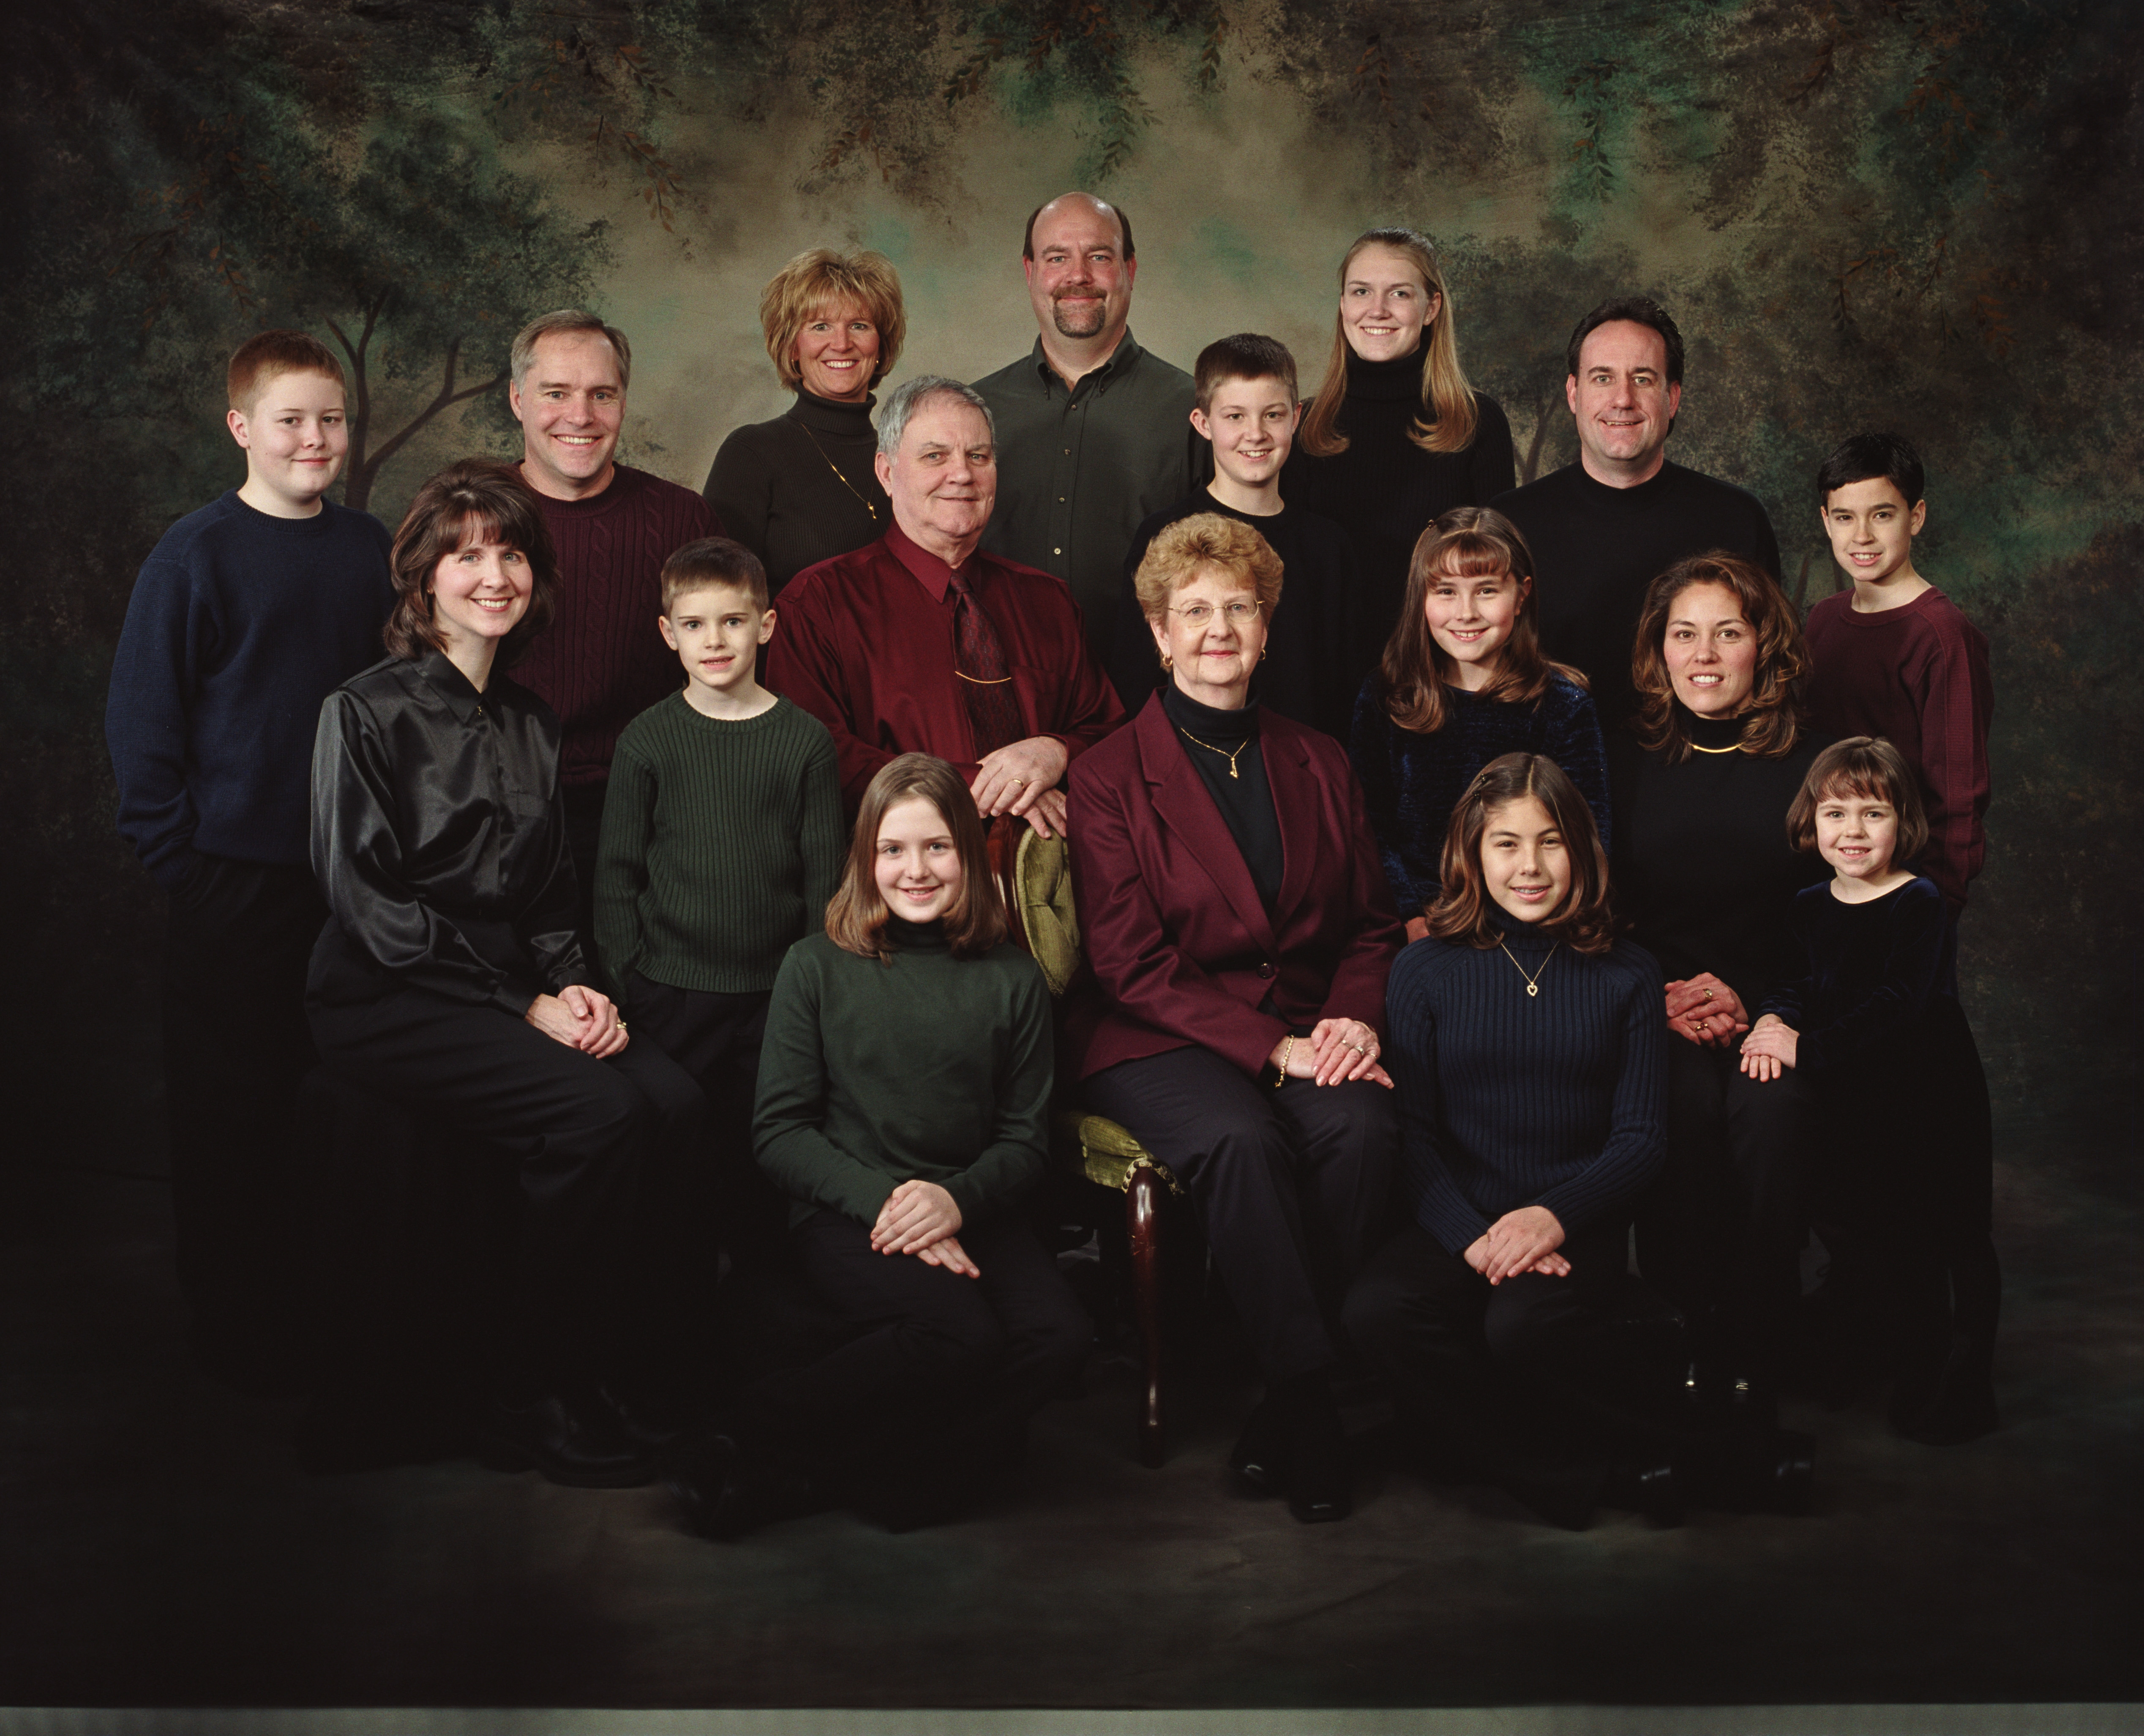 KenMar graphy Blog PREPARING FOR YOUR FAMILY PORTRAIT